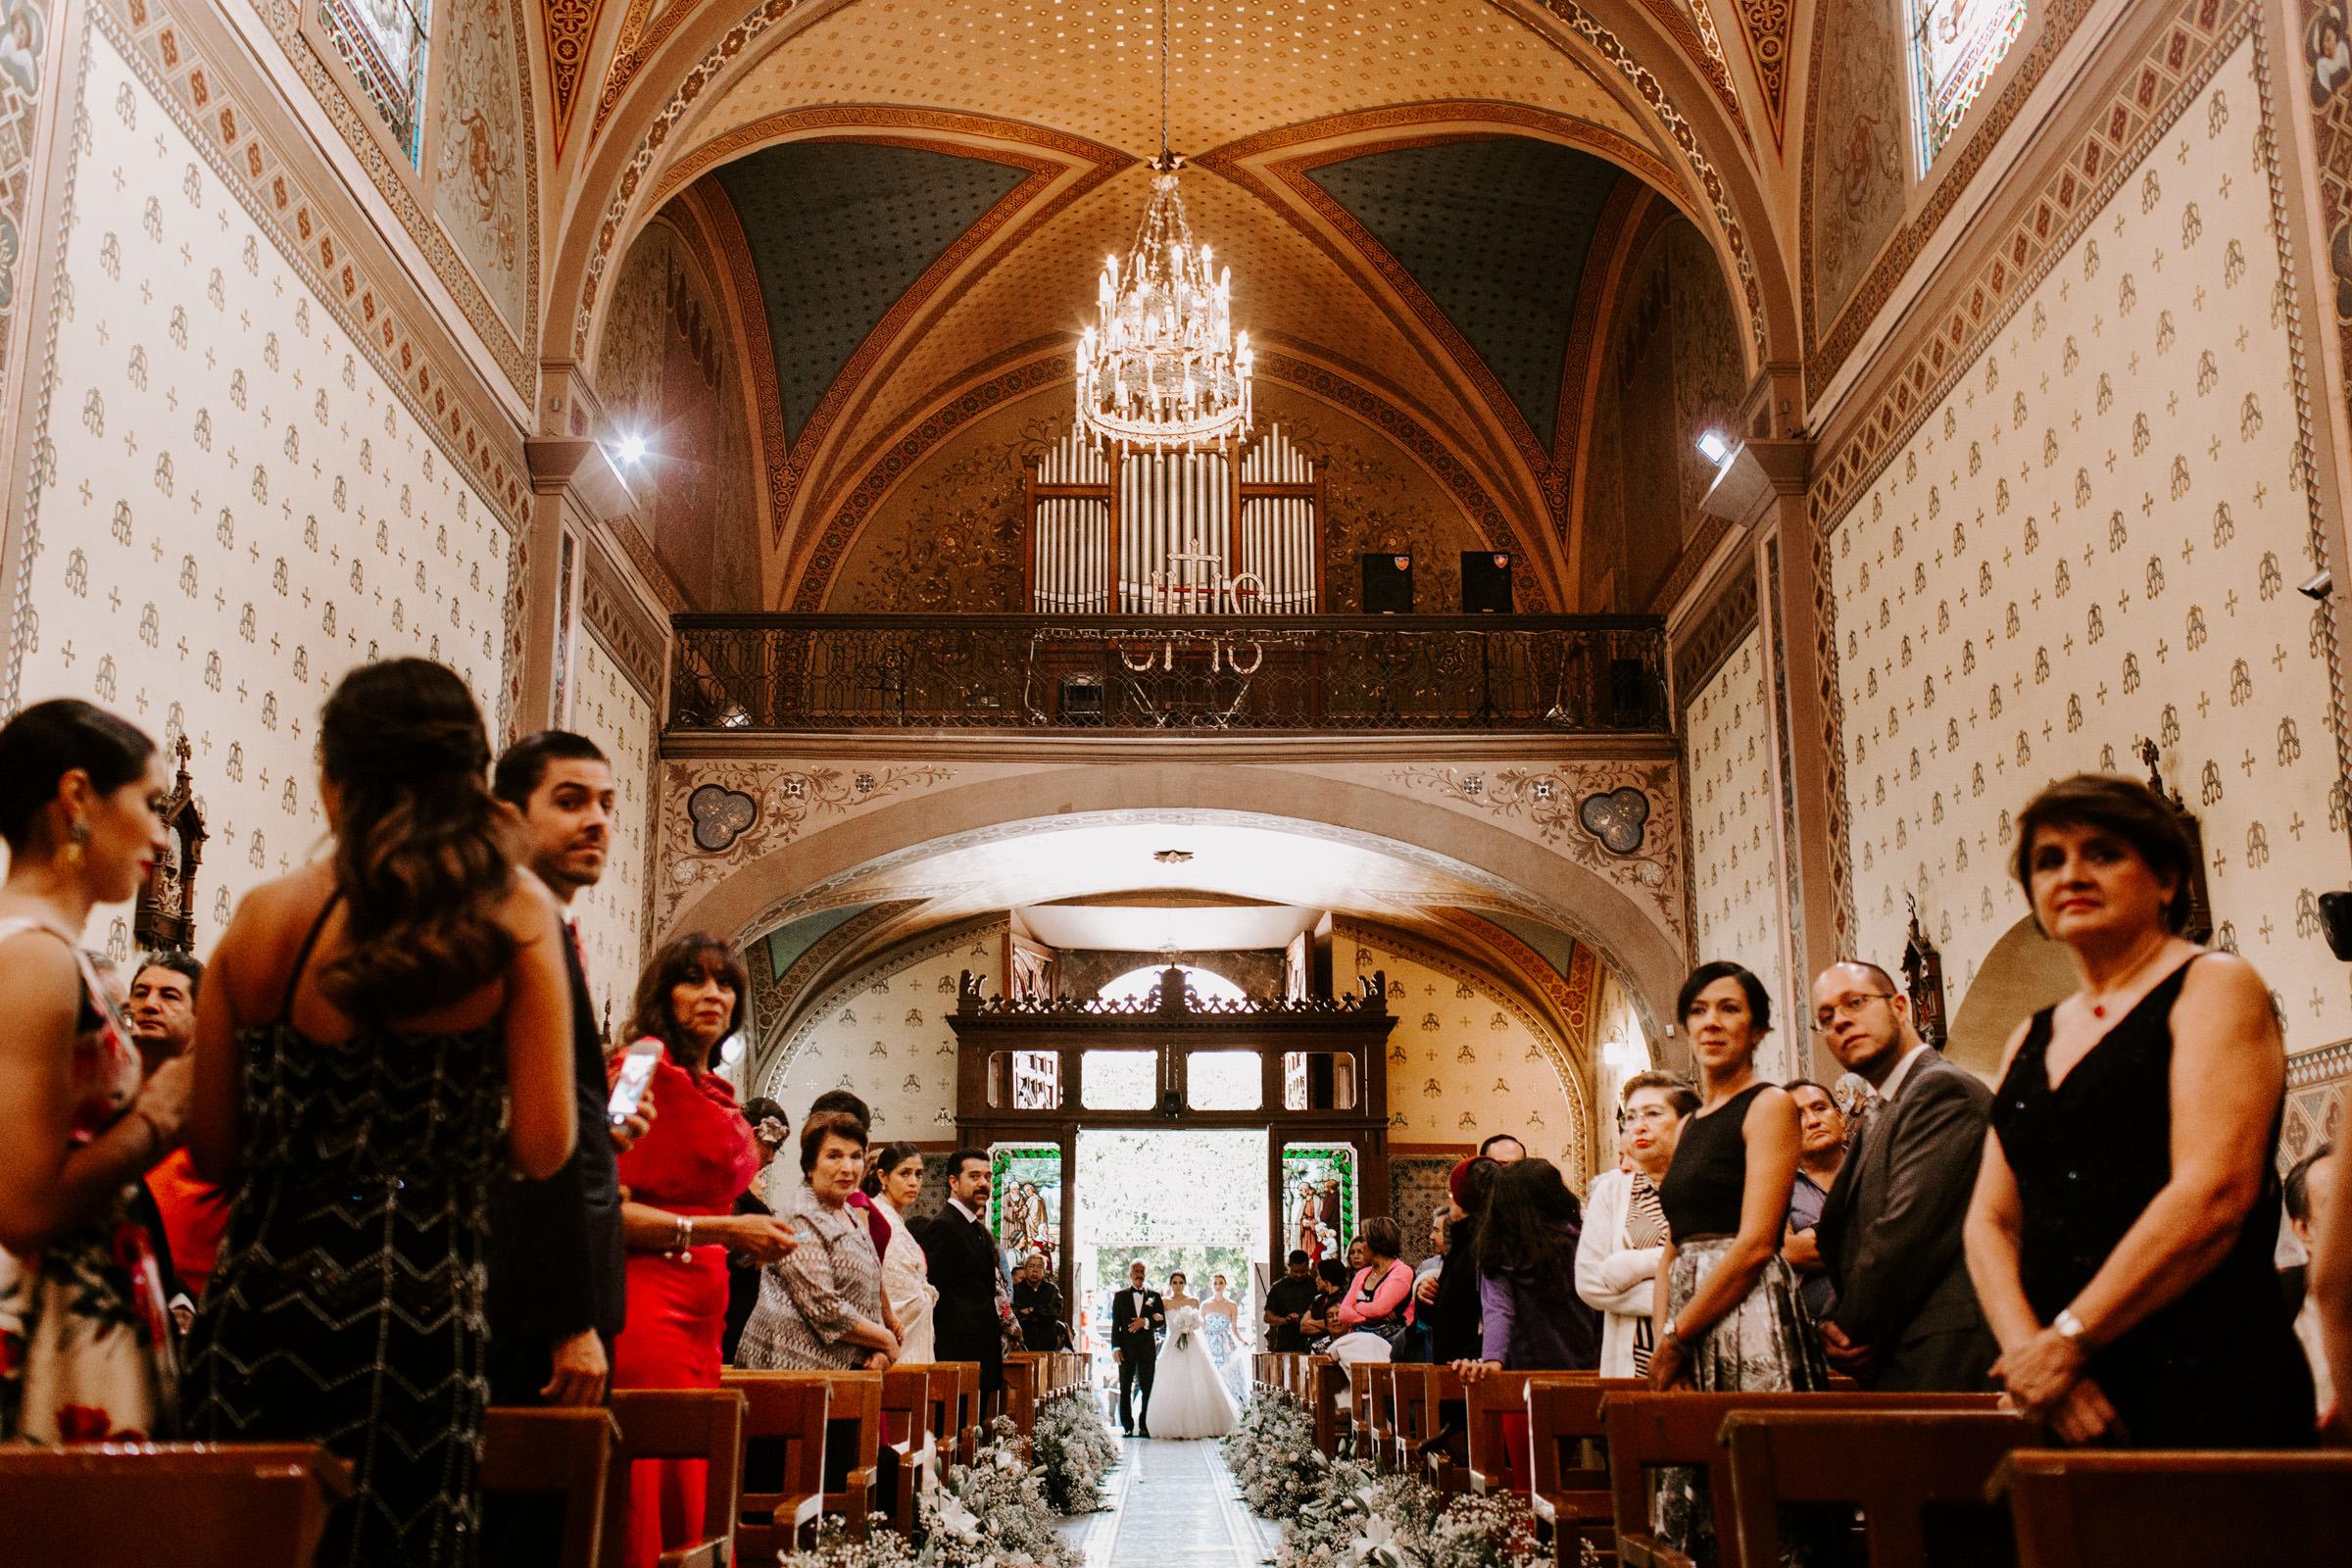 Casa-del-Rector-Hotel-Guanajuato-Bodas-Fotografo-Antigua-Hacienda-Barrera-VK-Pierce-0078.JPG